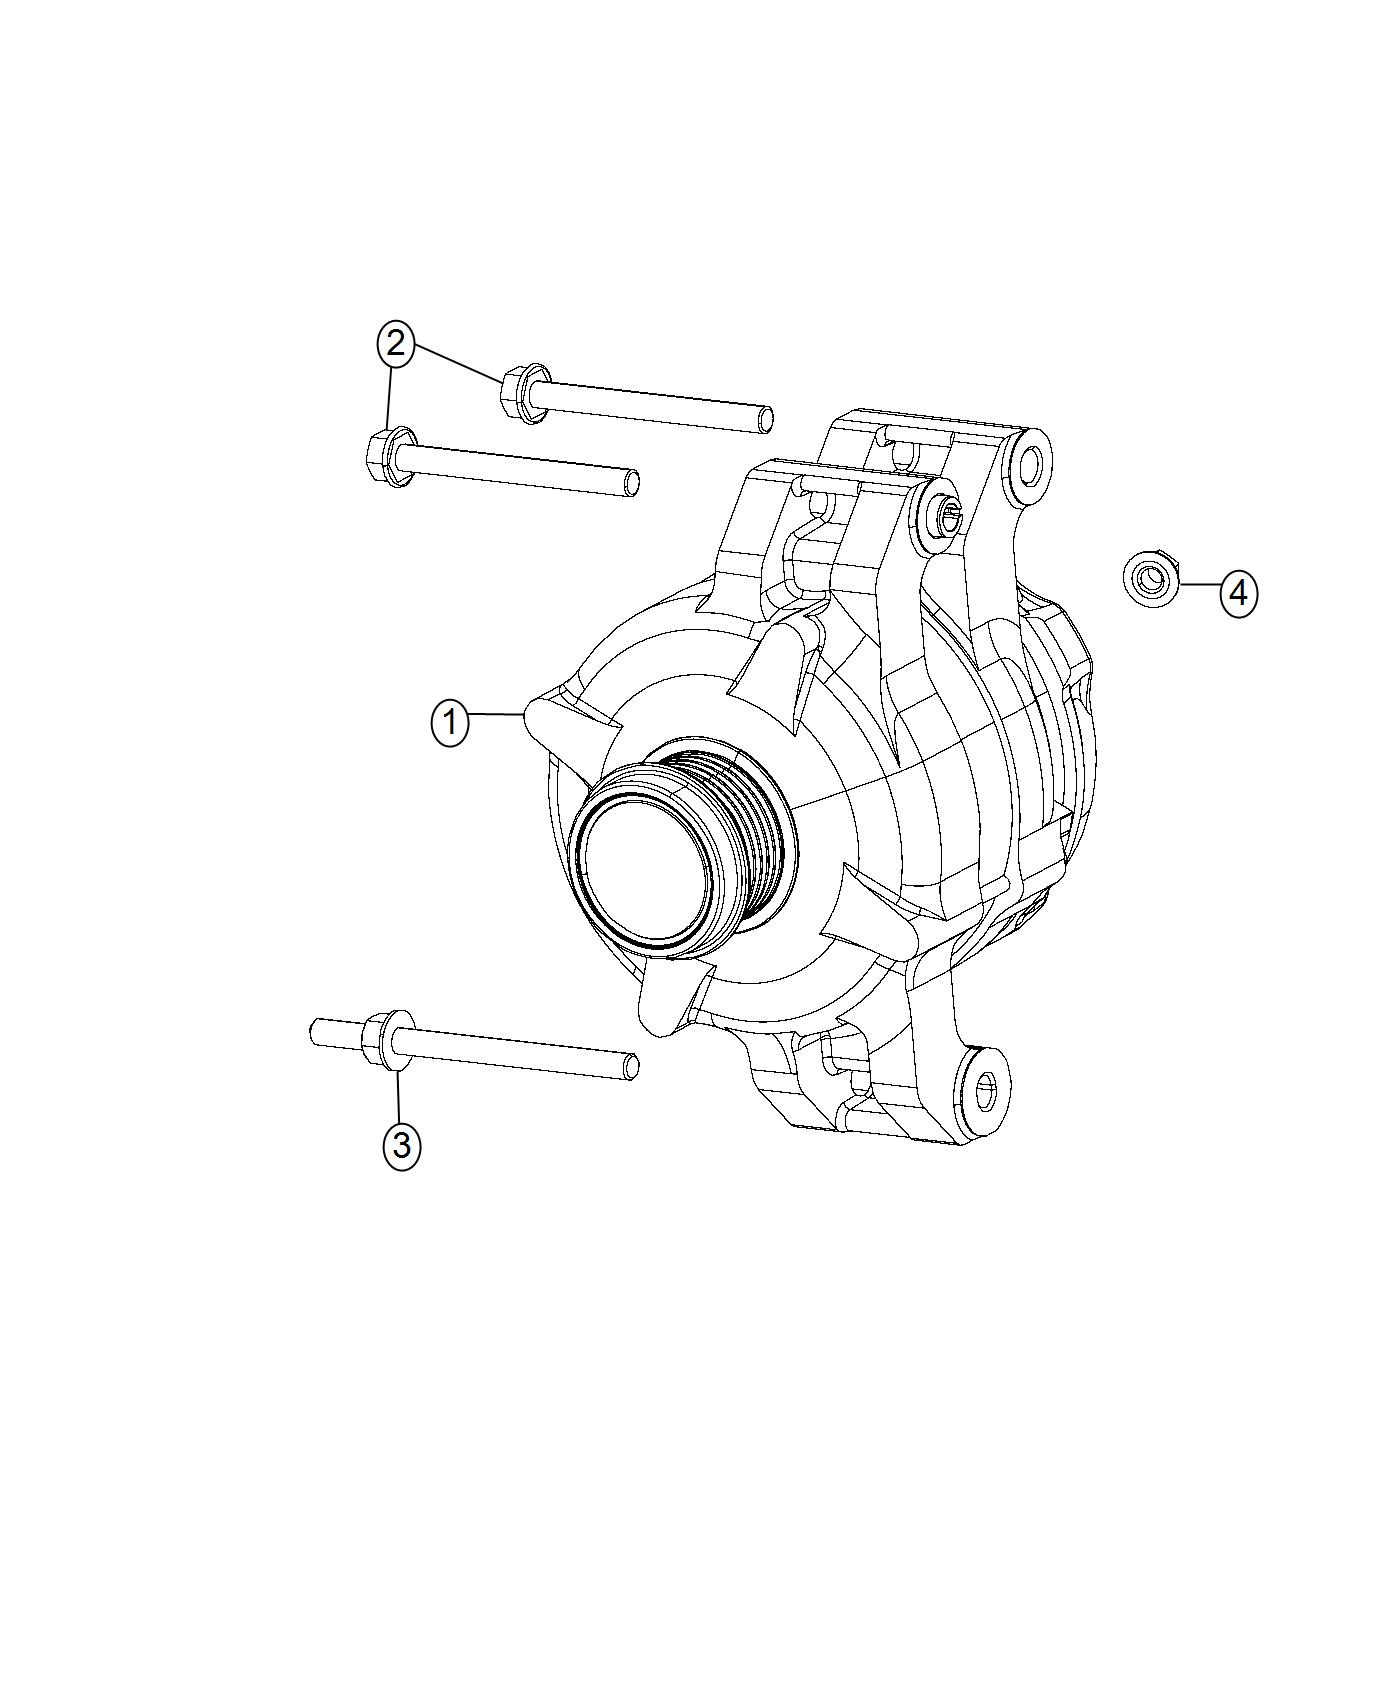 jeep grand cherokee generator engine 220 amp alternator